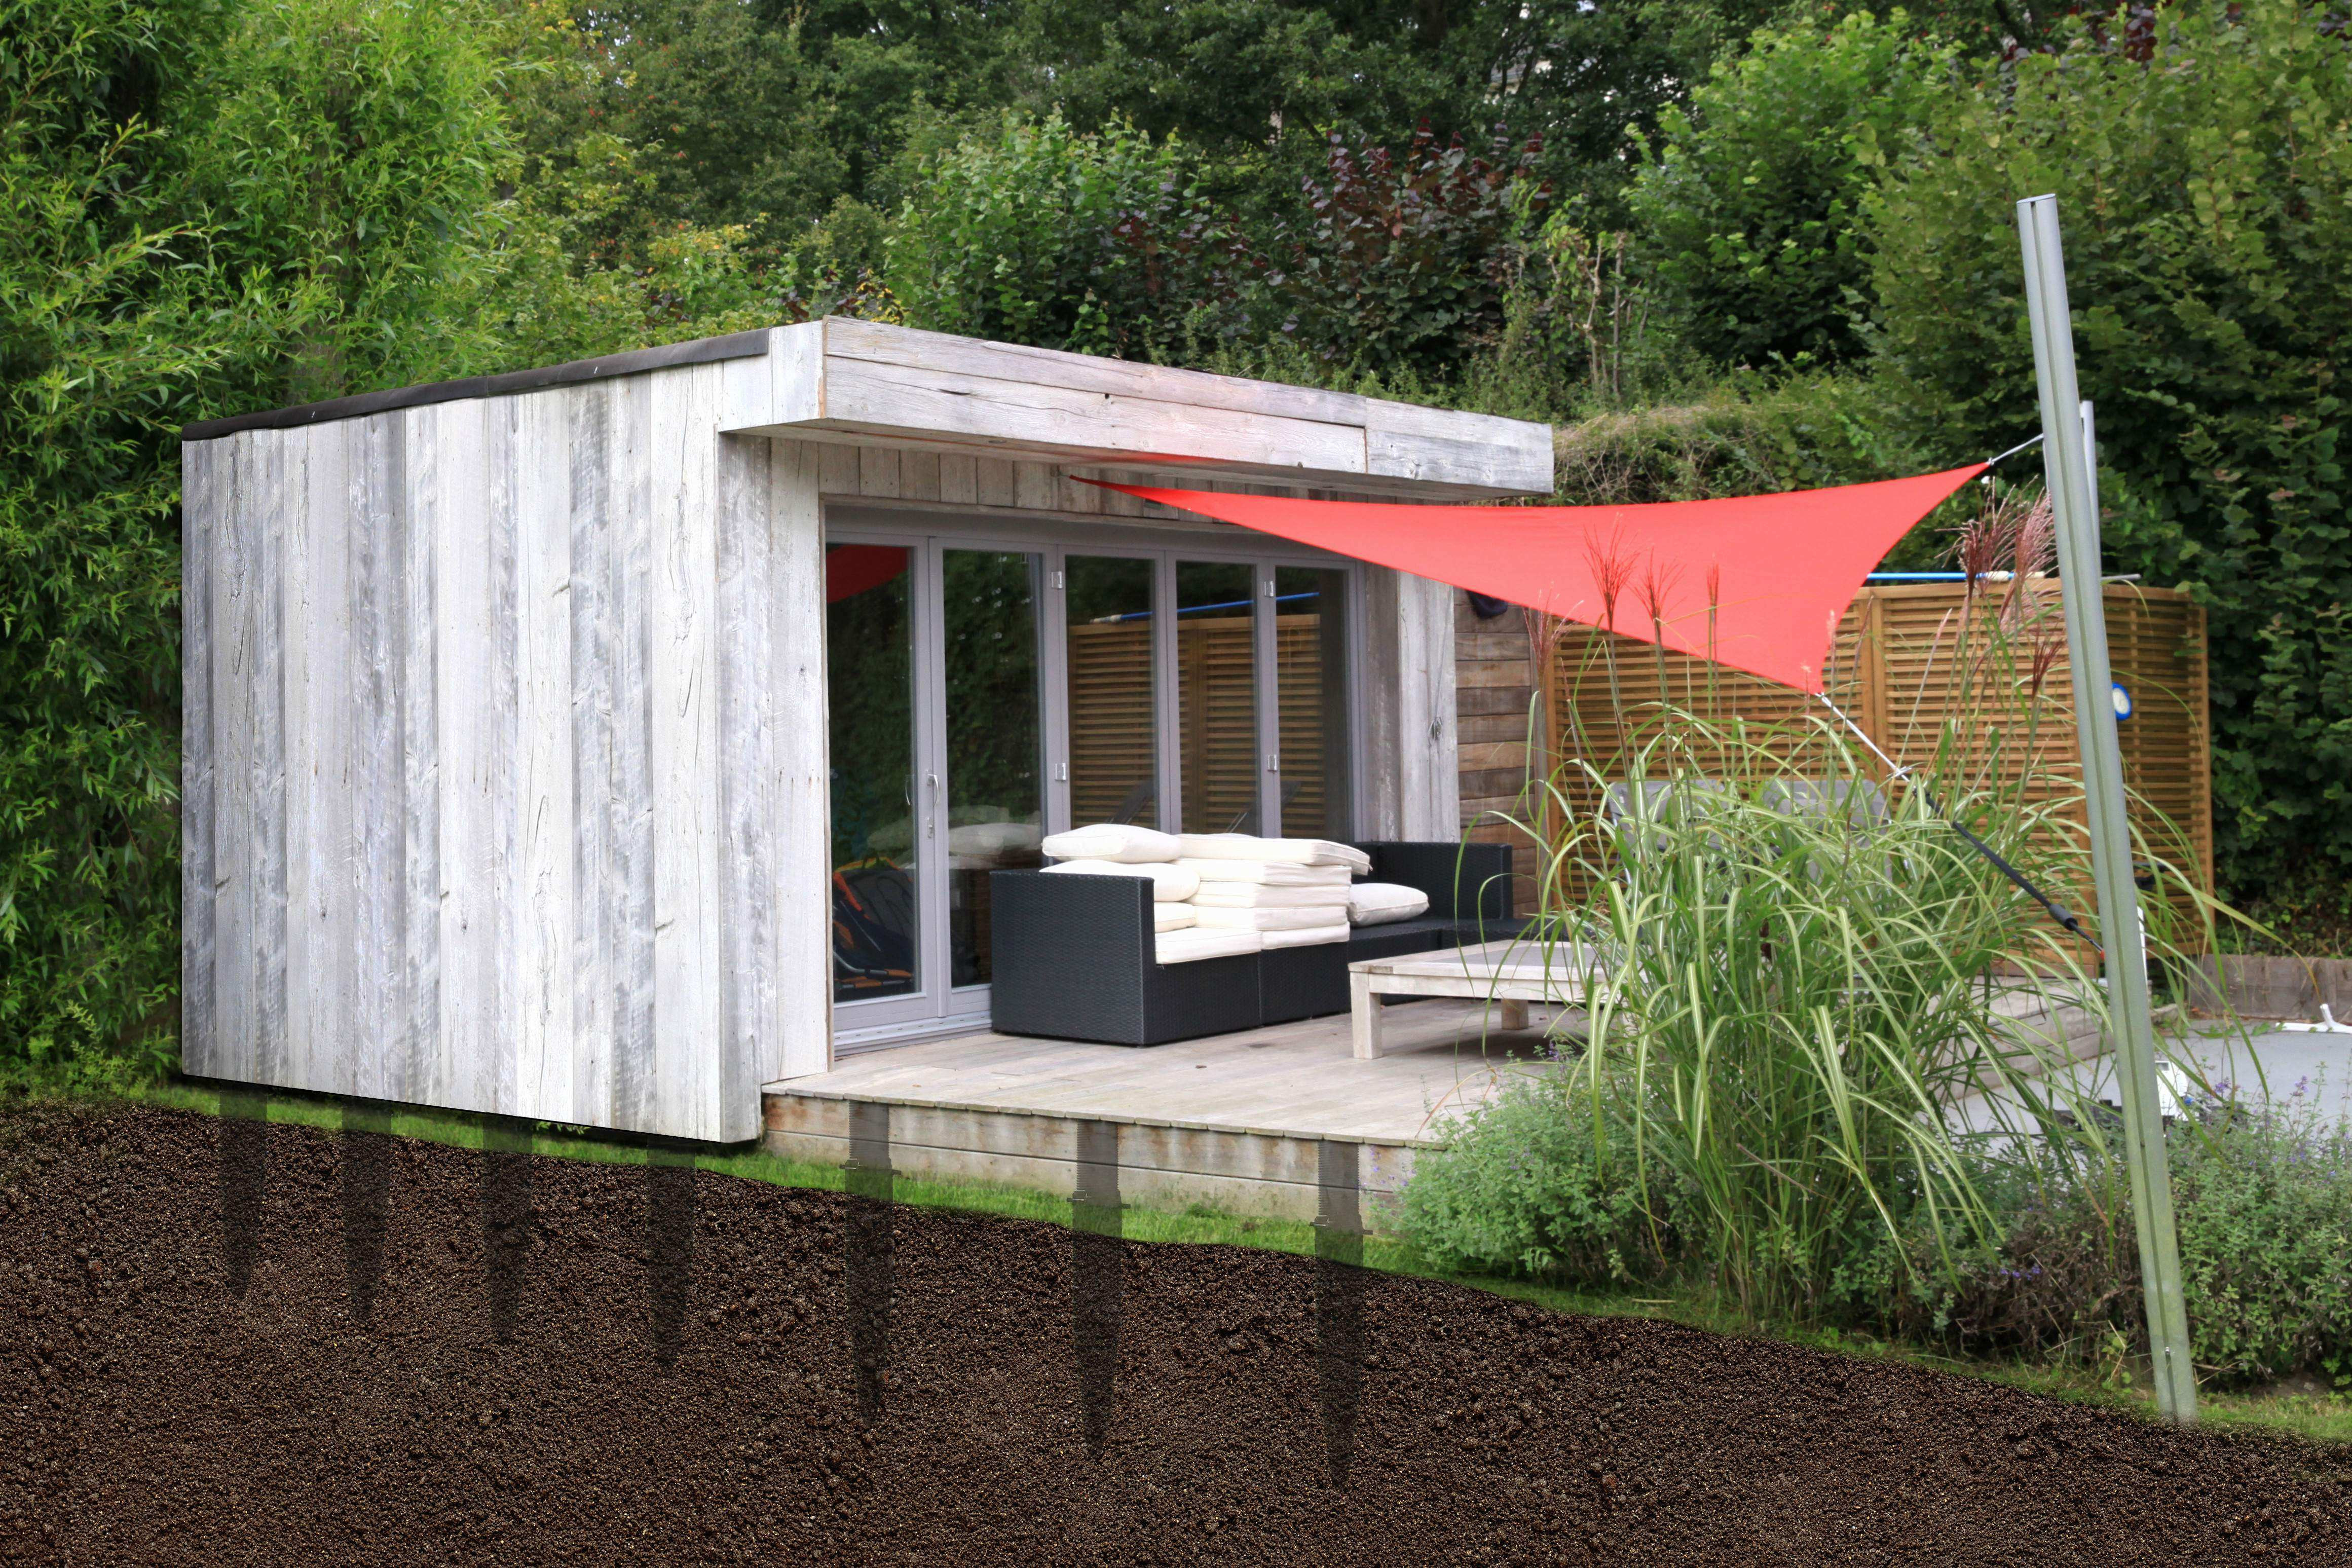 Abri De Jardin En Bois Bricorama Génial Bordure De Jardin tout Abri De Jardin Bricorama